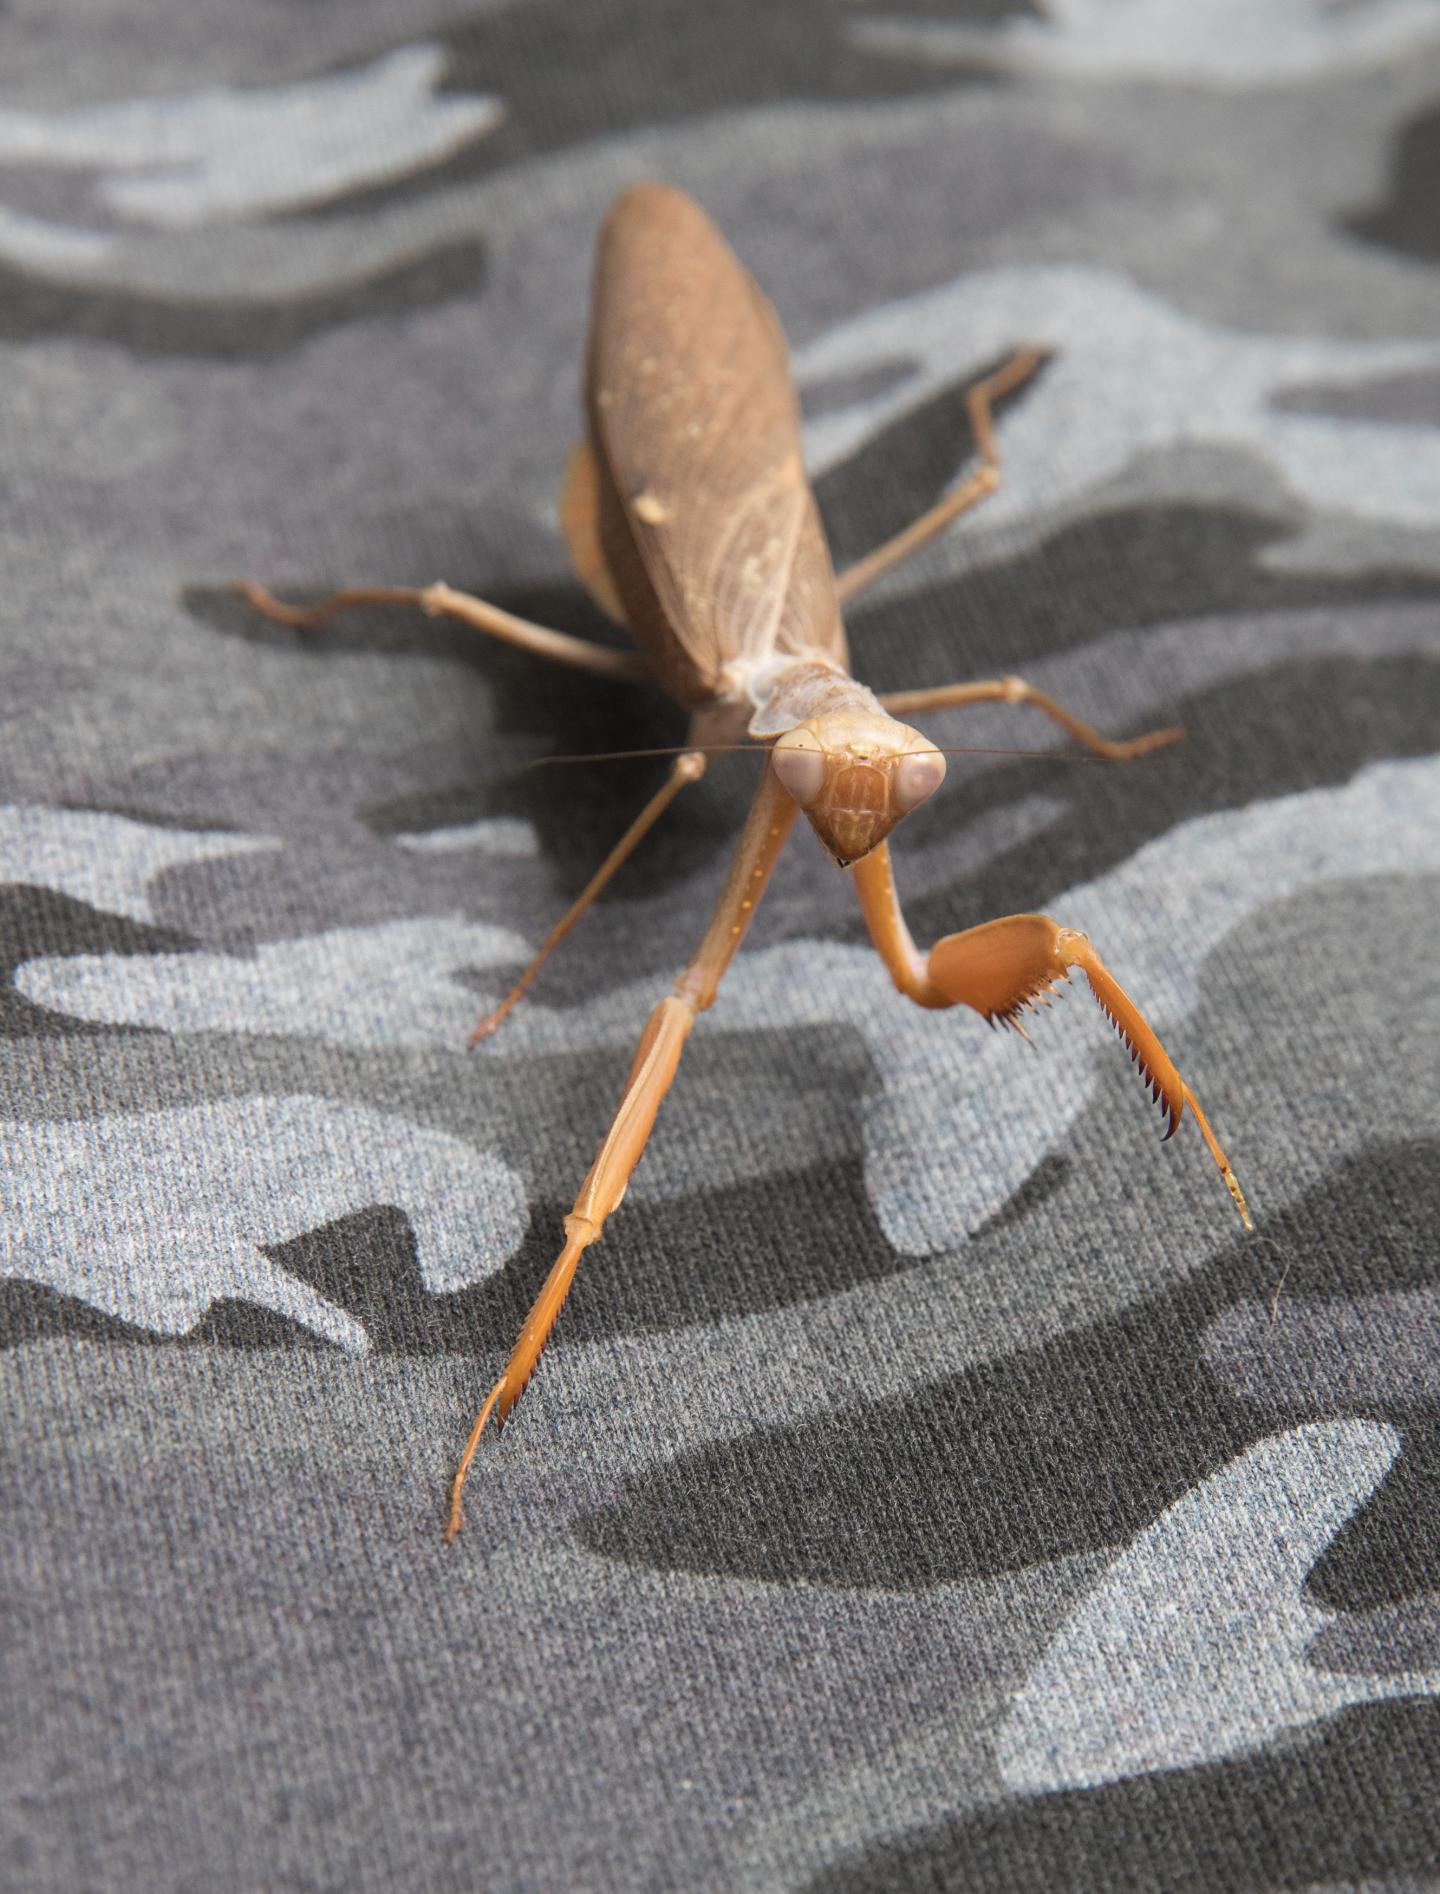 Praying Mantis on Camouflage Material